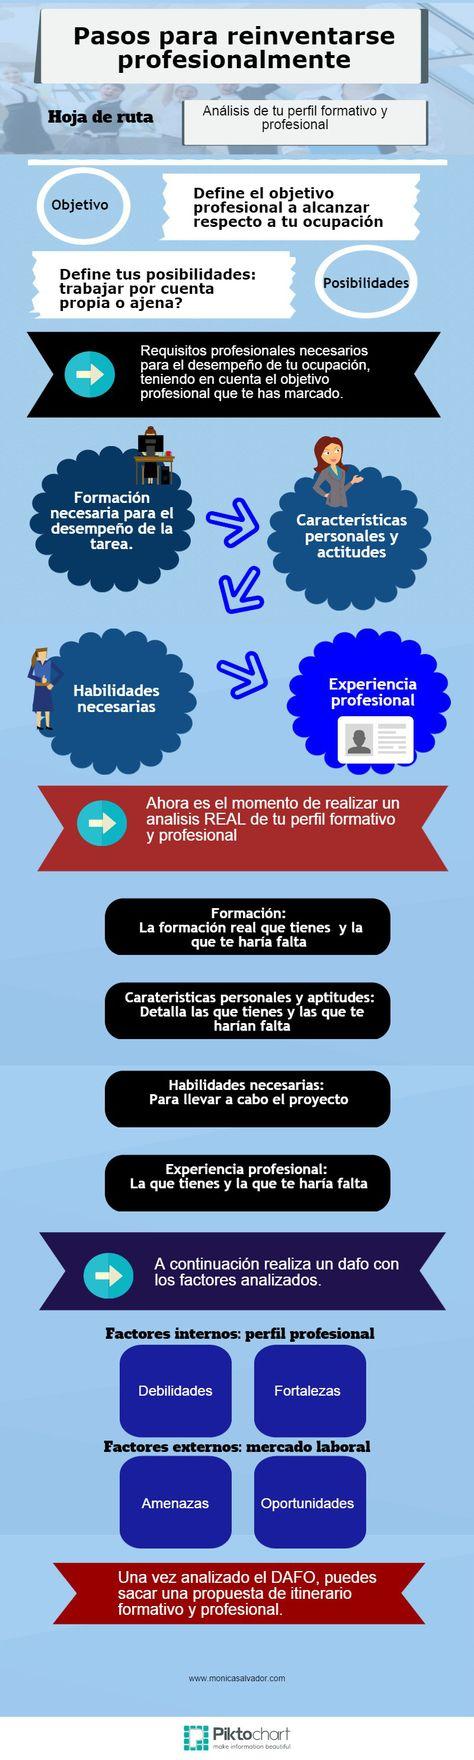 Pasos para reinventarse profesionalmente #infografia #infographic #empleo